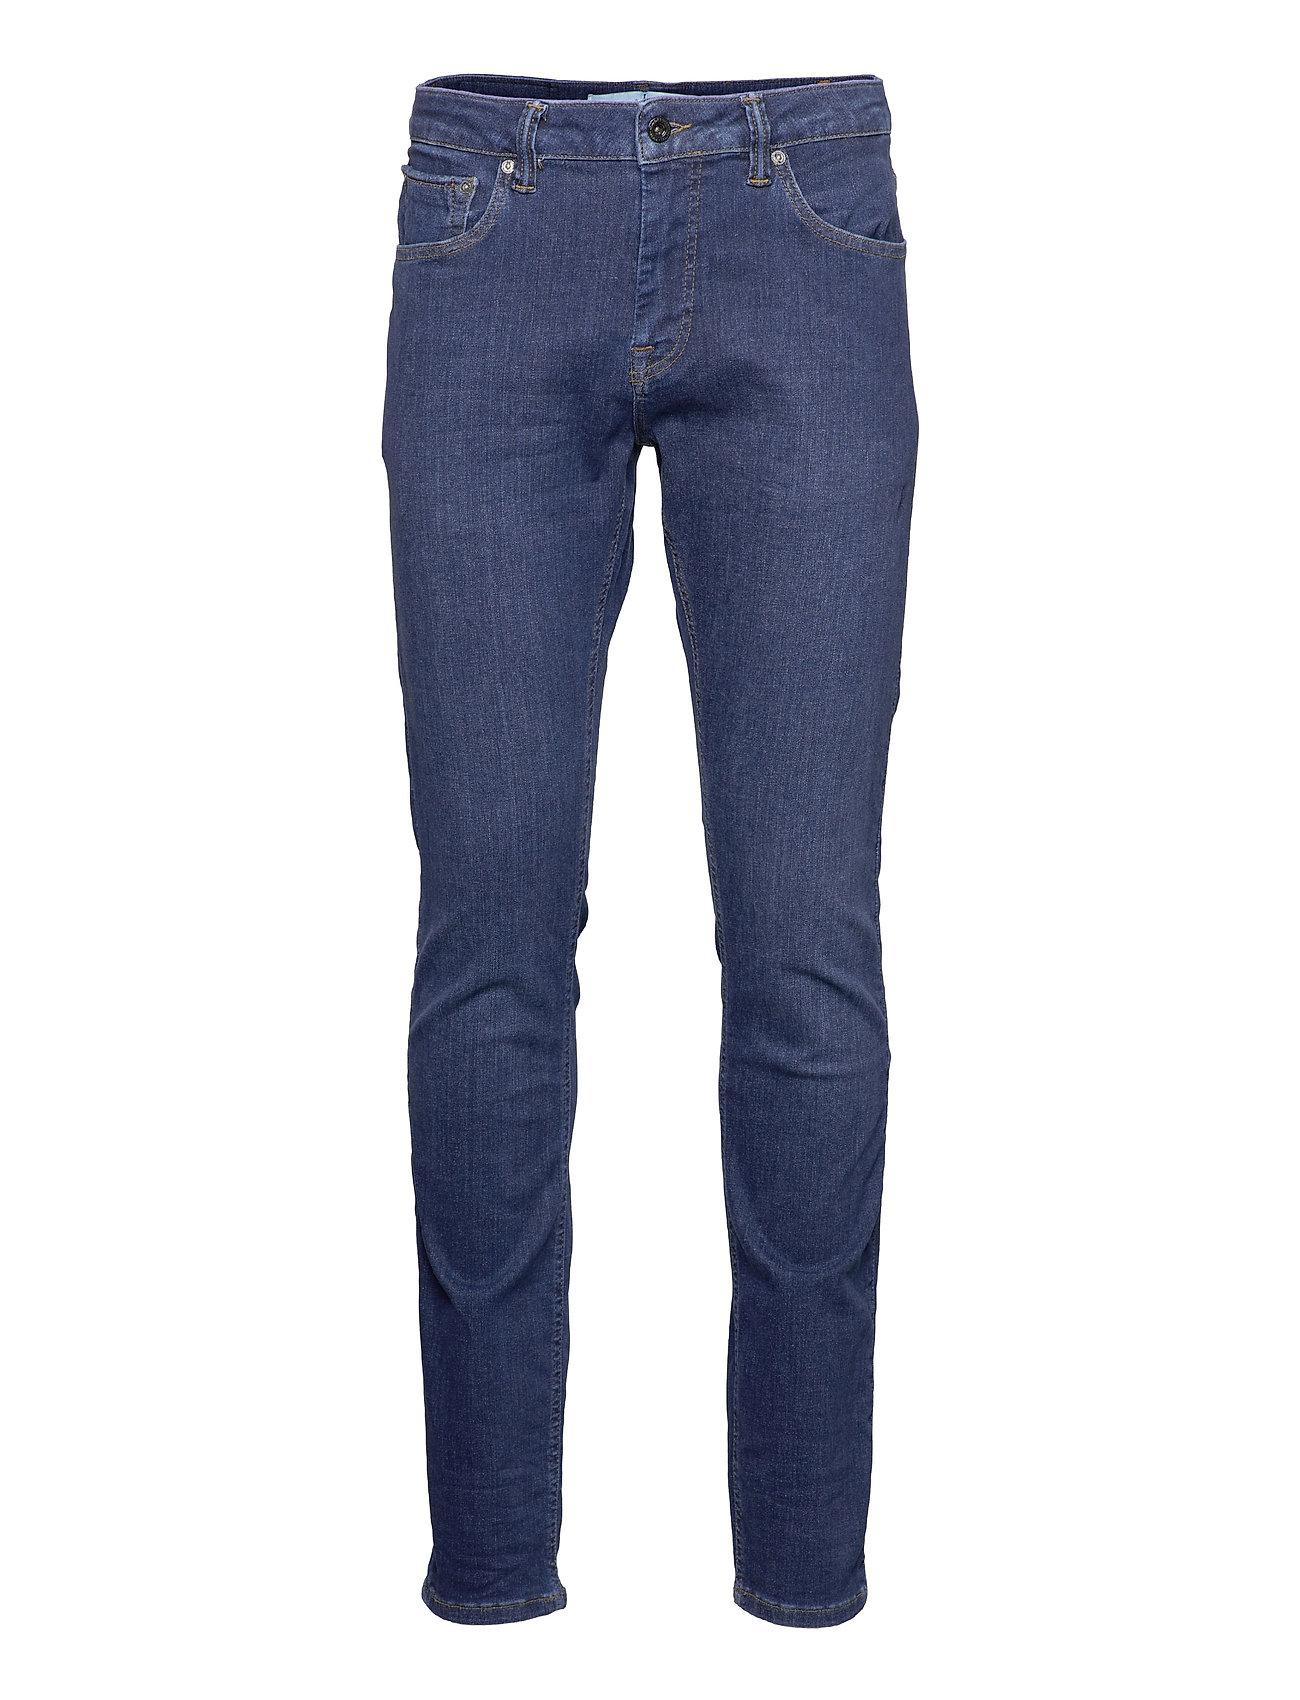 Image of J S K4083 Jeans Slim Jeans Blå Gabba (3559506831)